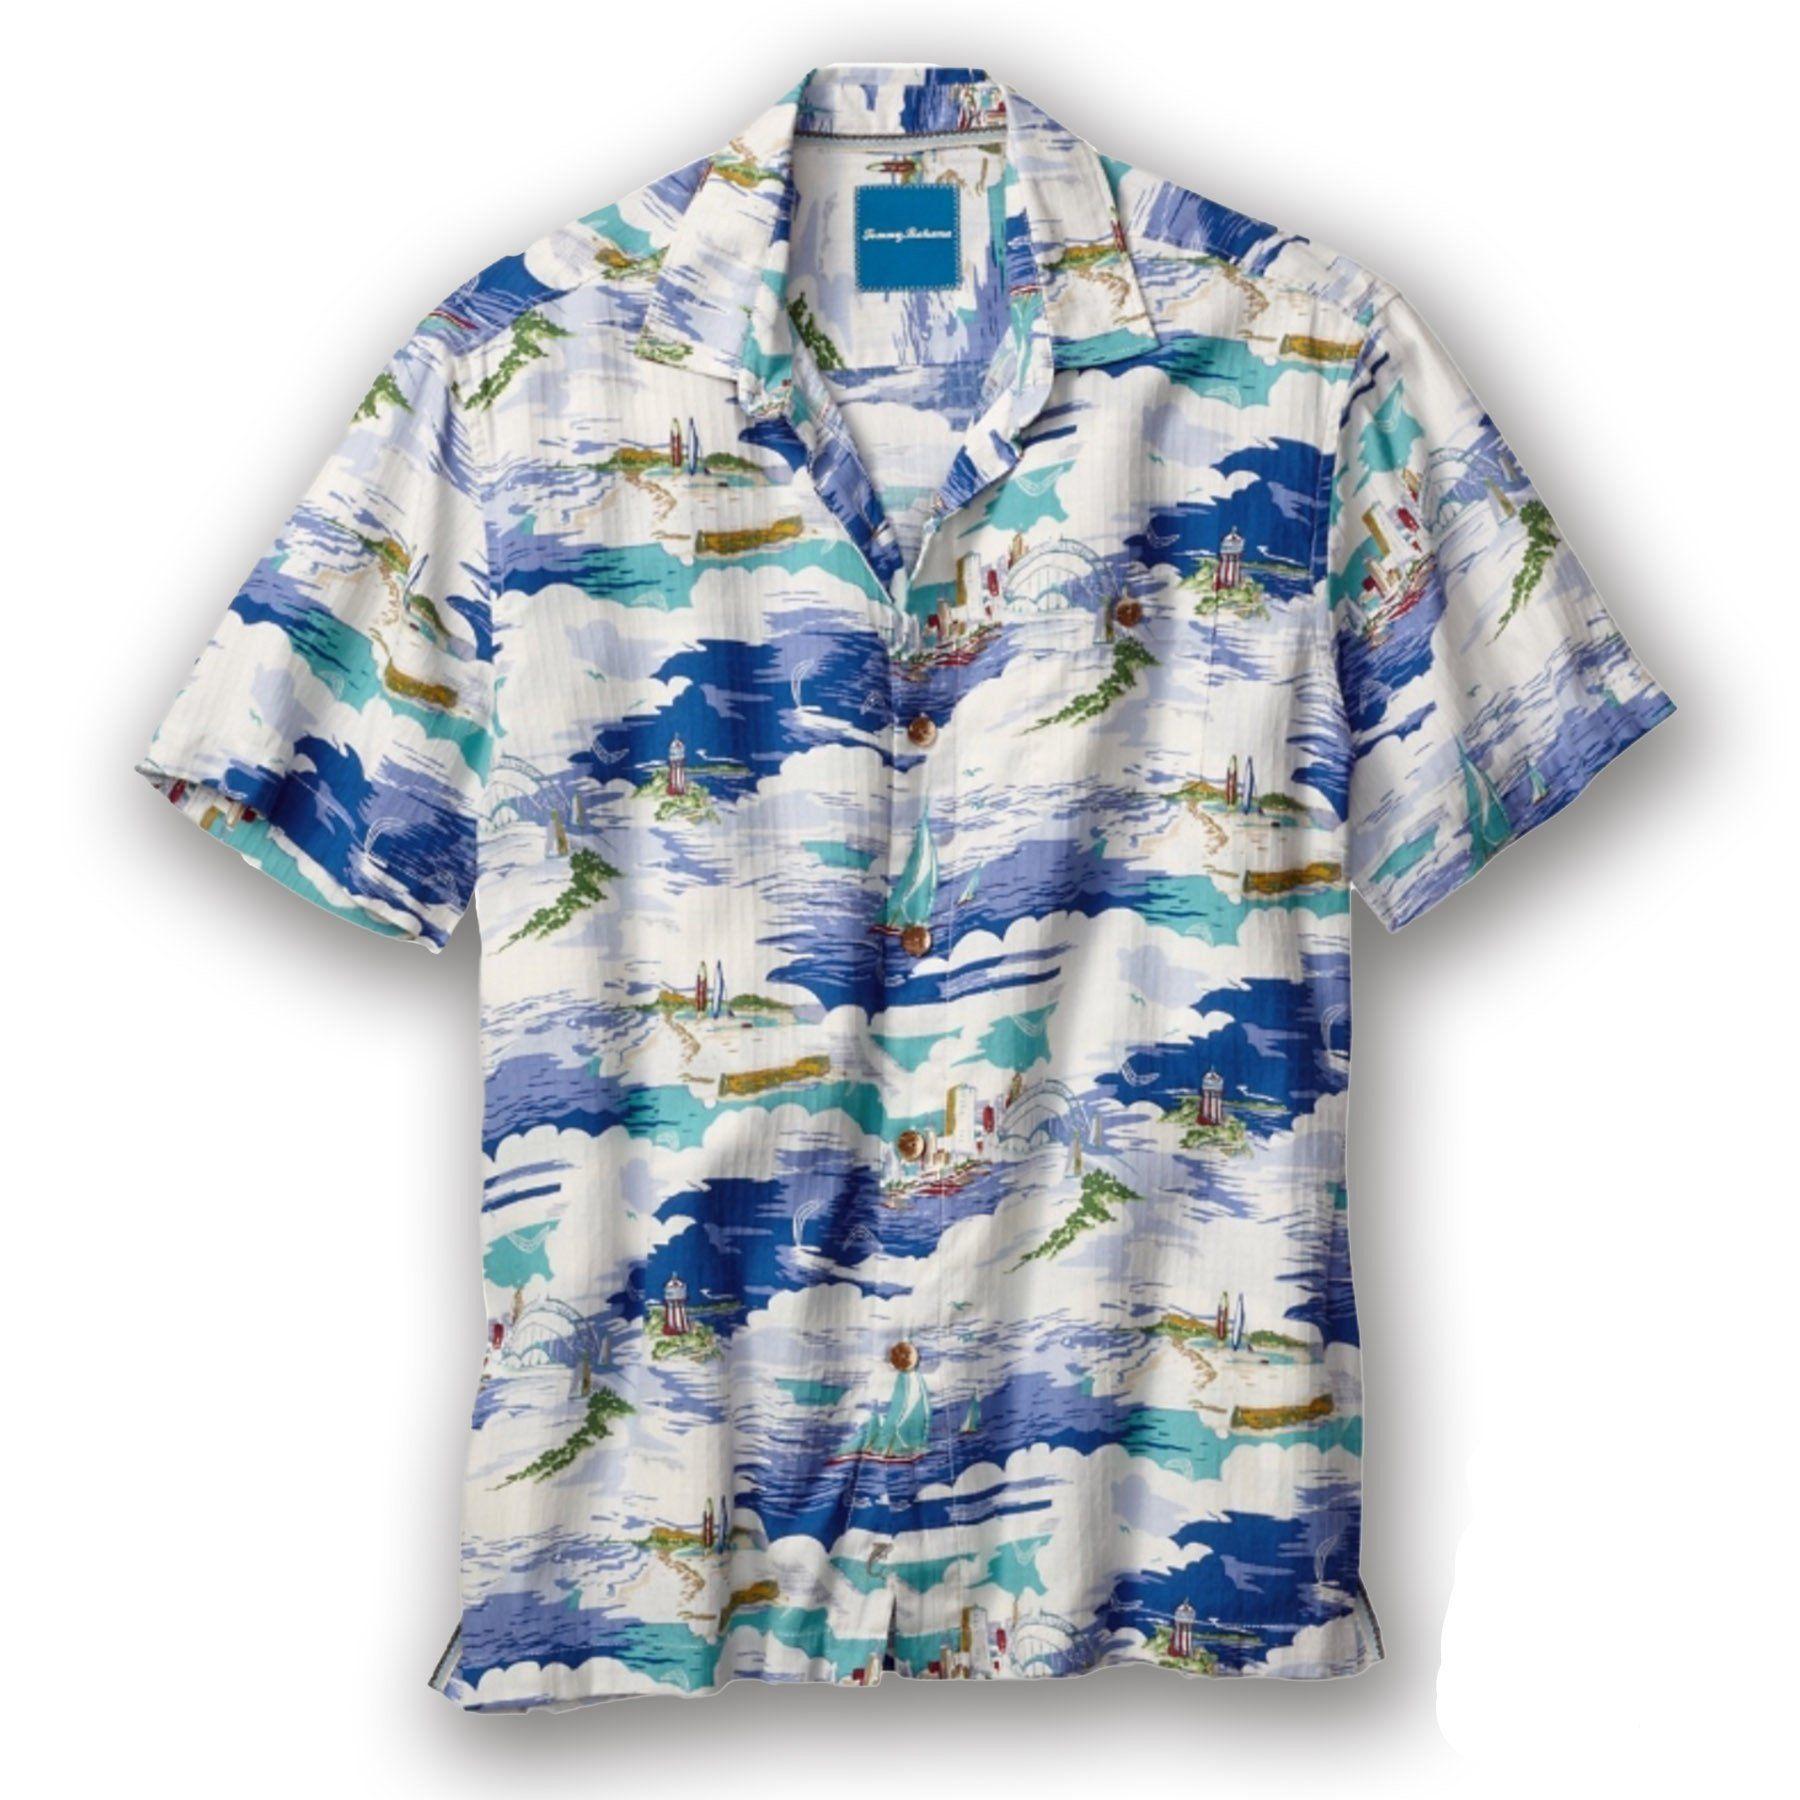 Men's Tommy Bahama | Sydney Skyline Camp Shirt | S/S | Bright Cobalt